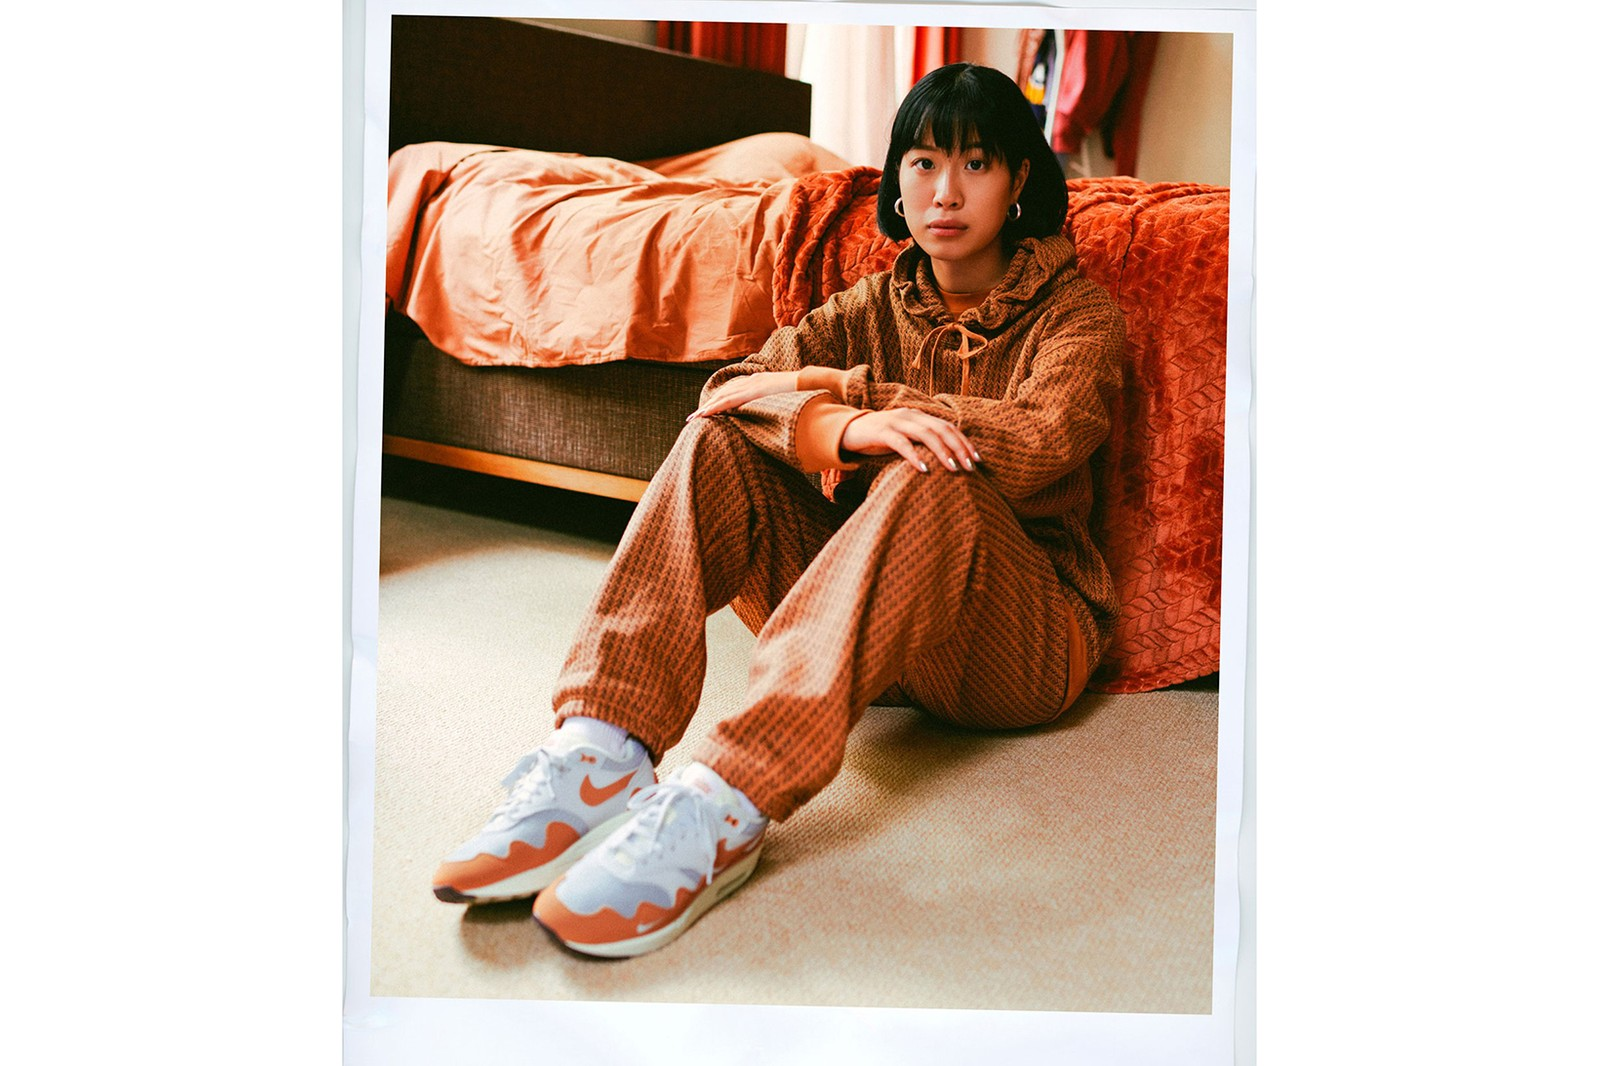 Patta Nike Air Max 1 AM 1 Monarch Orange White Sneakers Footwear Collaboration